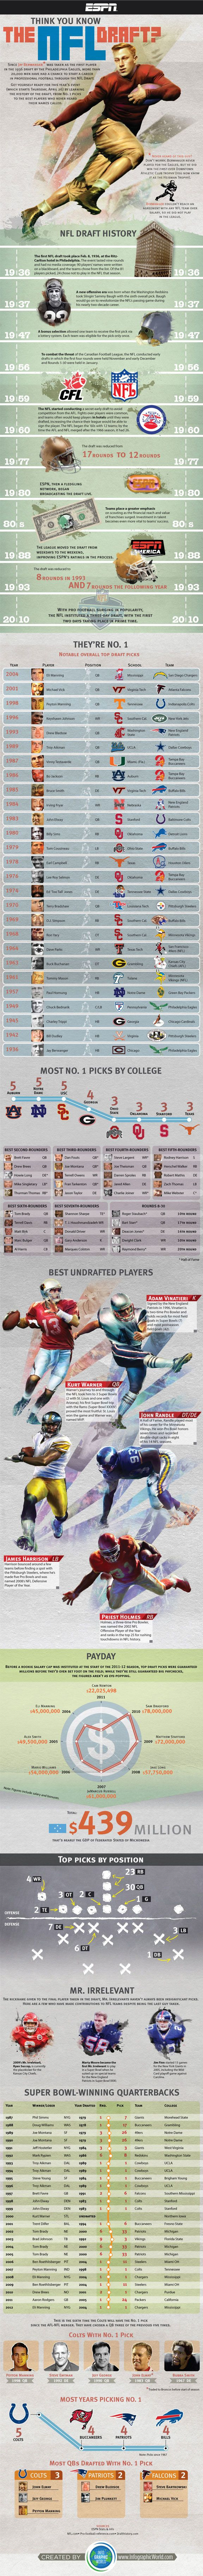 Draft Infographic